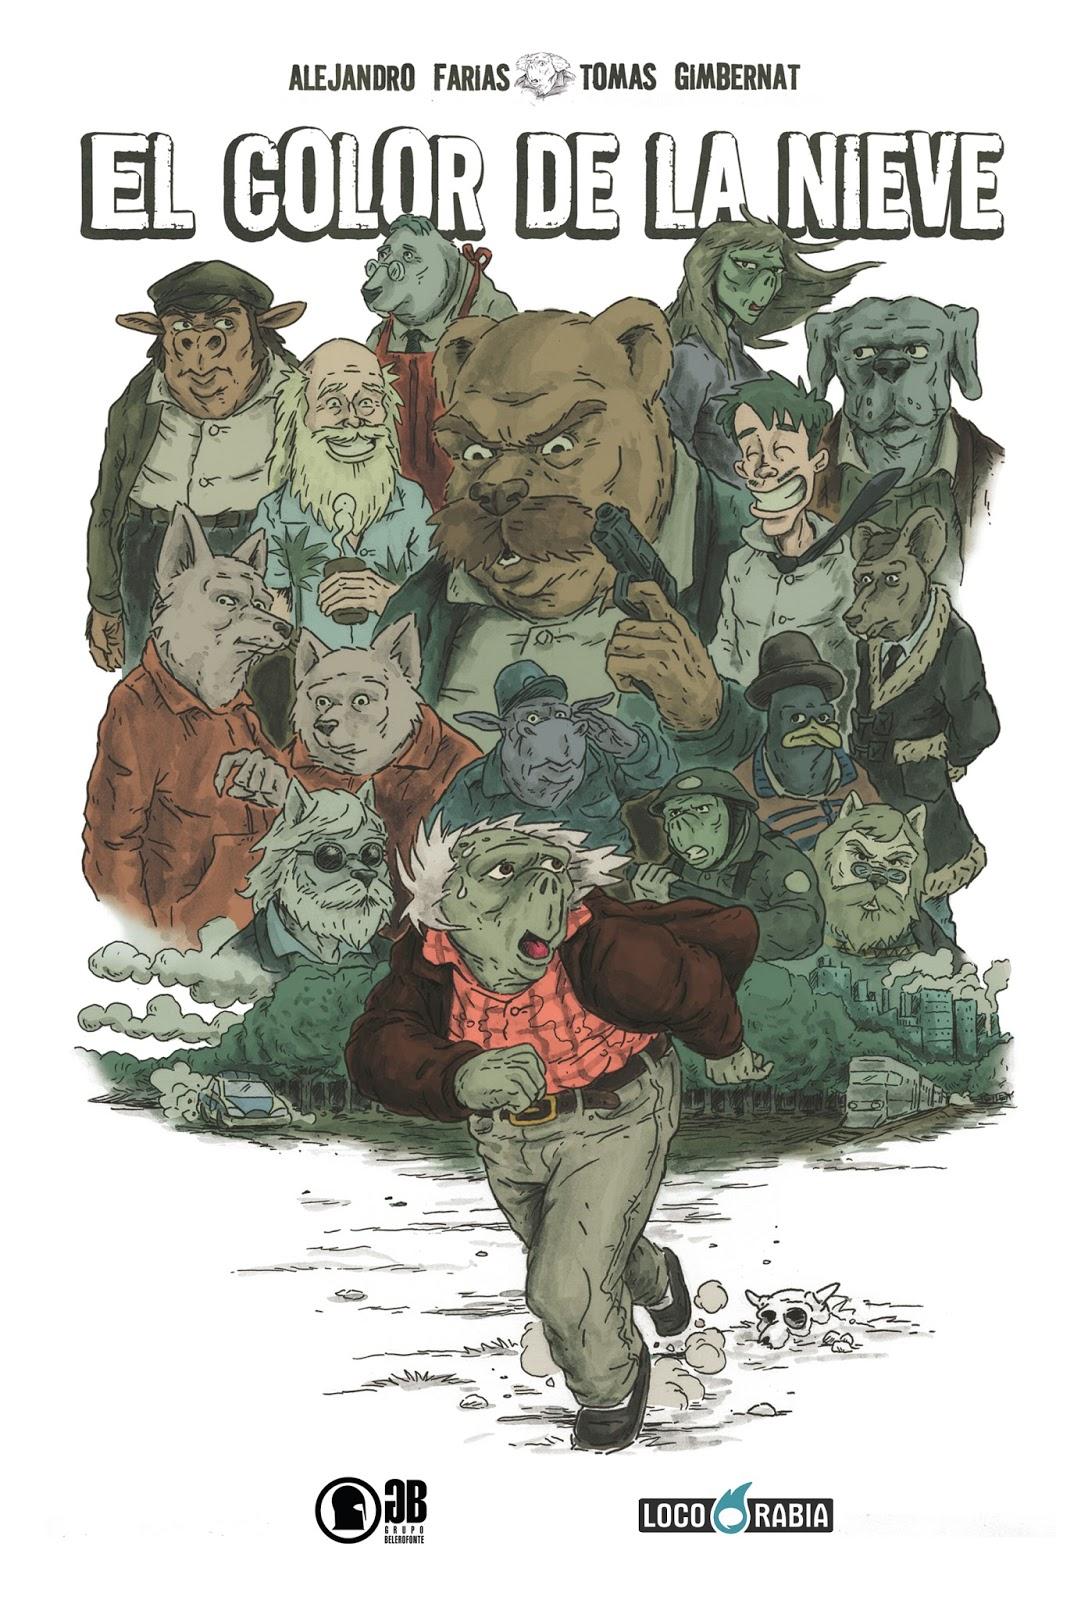 01 -  [Comics] Siguen las adquisiciones 2016 - Página 26 Tapa%2BEl%2Bcolor%2Bde%2Bla%2Bnieve_Final